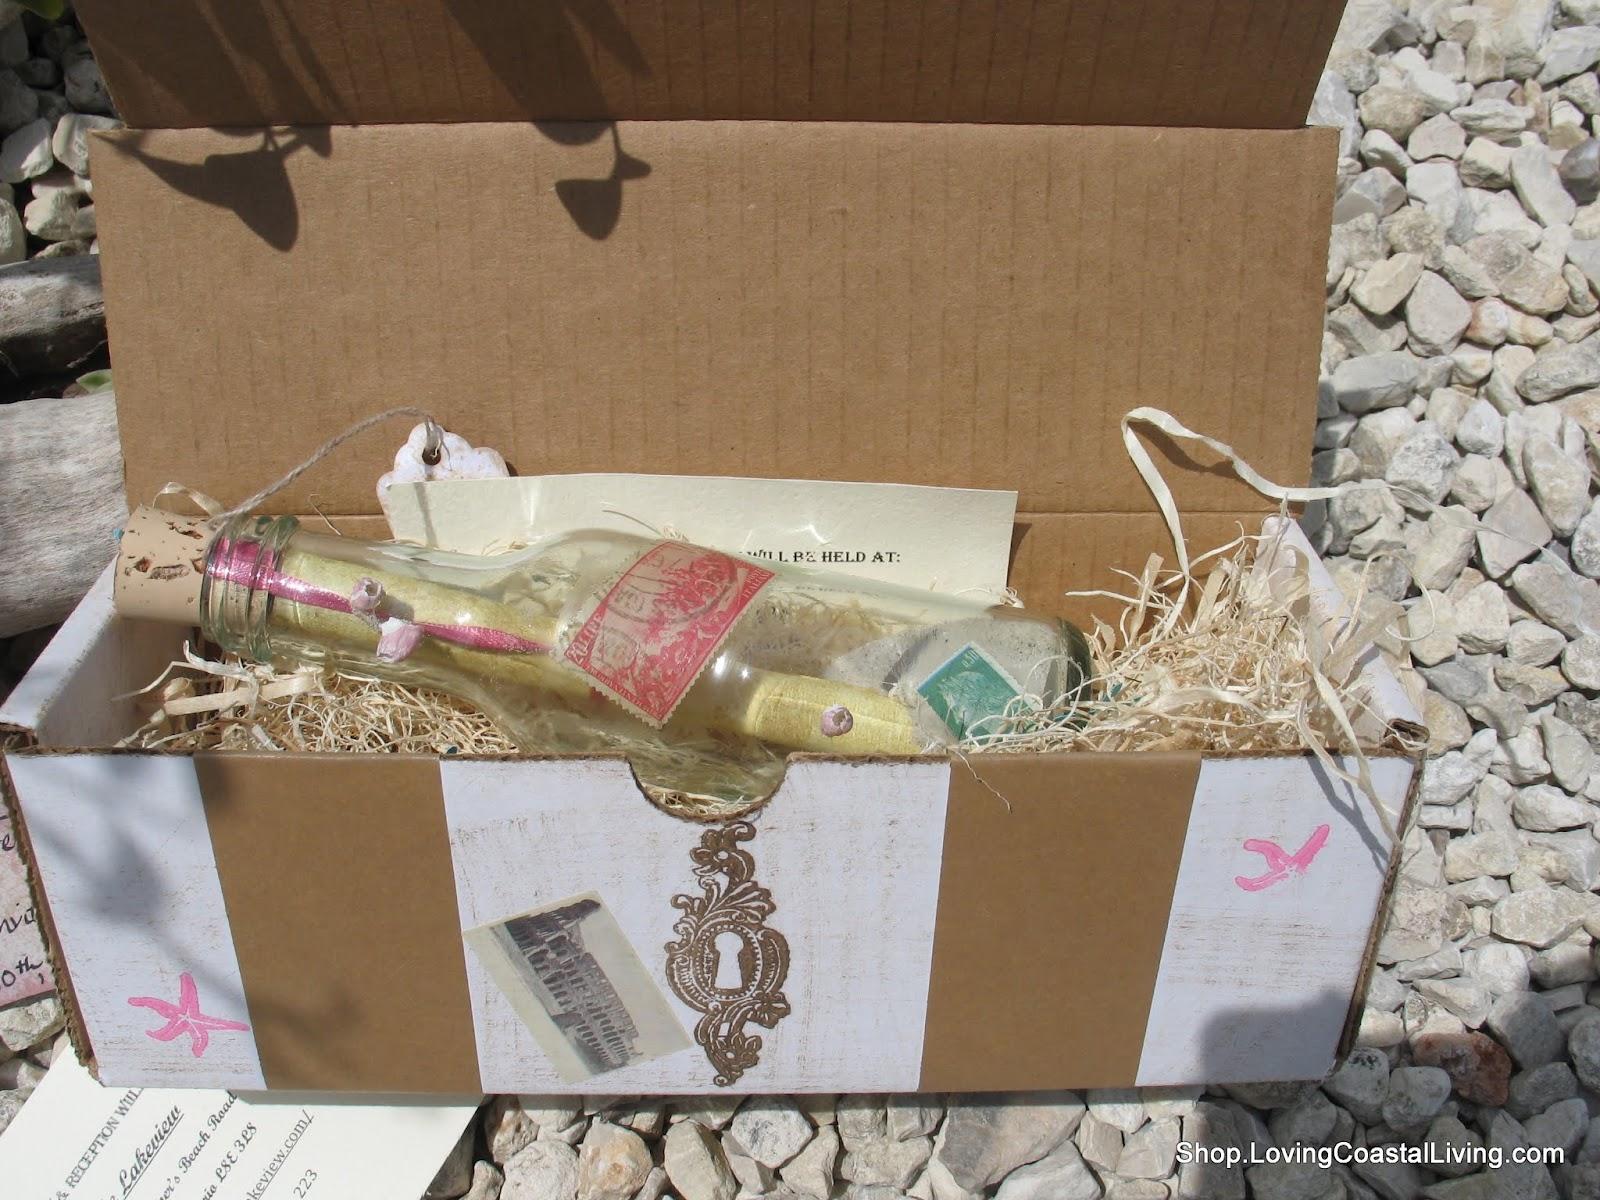 Message In A Bottle Wedding Invitations: SeaShellsbySeashore's The Shell Lady: Custom Message In A